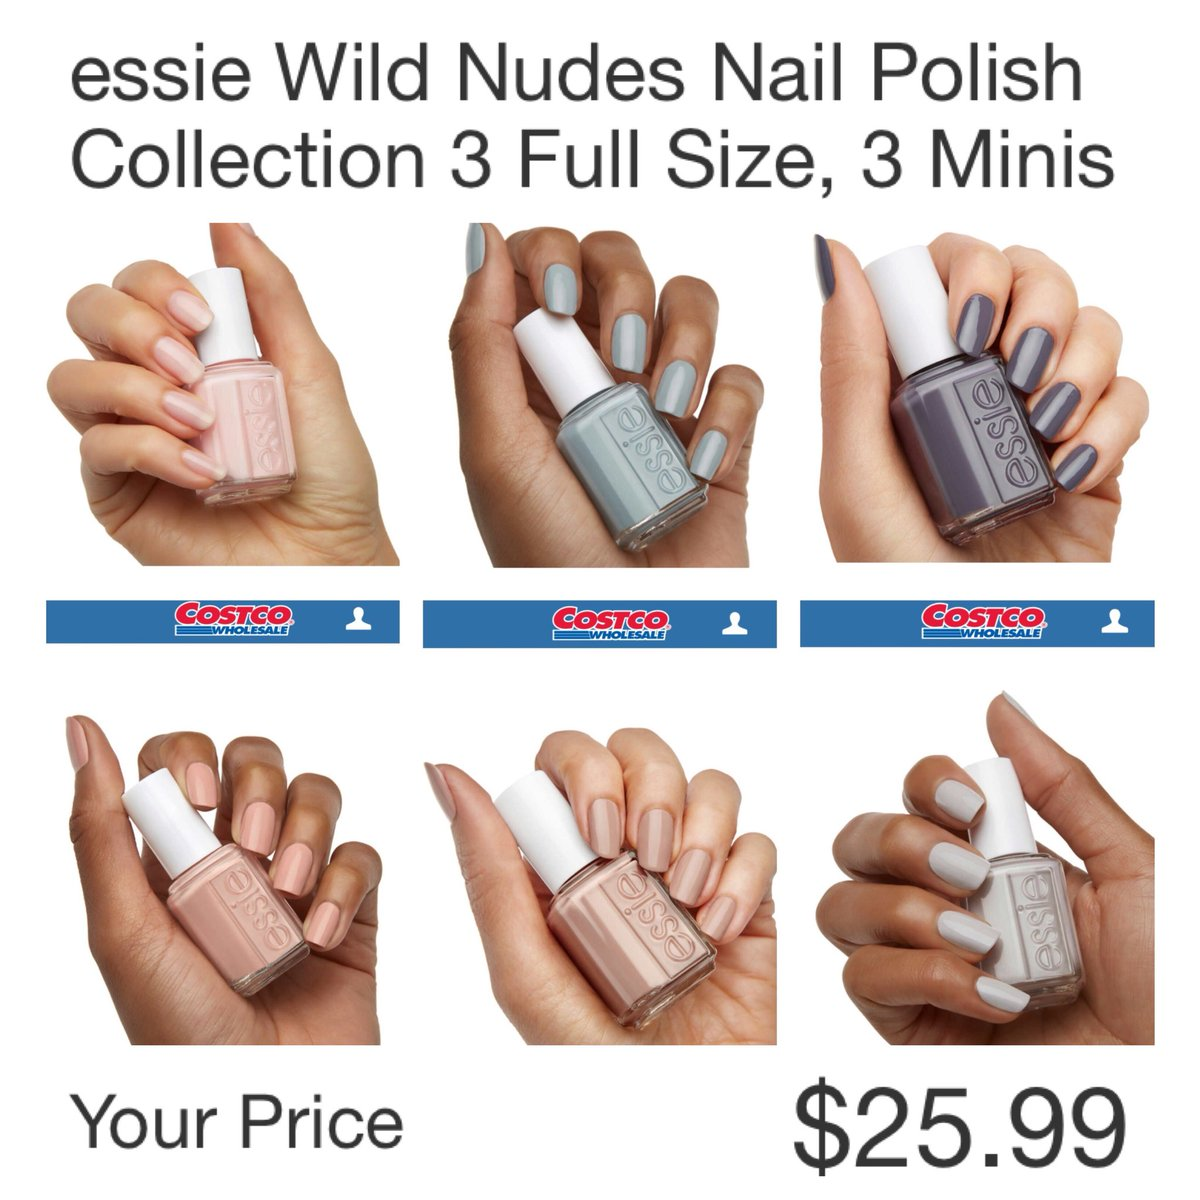 Thecostcoconnoisseur On Twitter Essie Wild Nudes Nailpolish